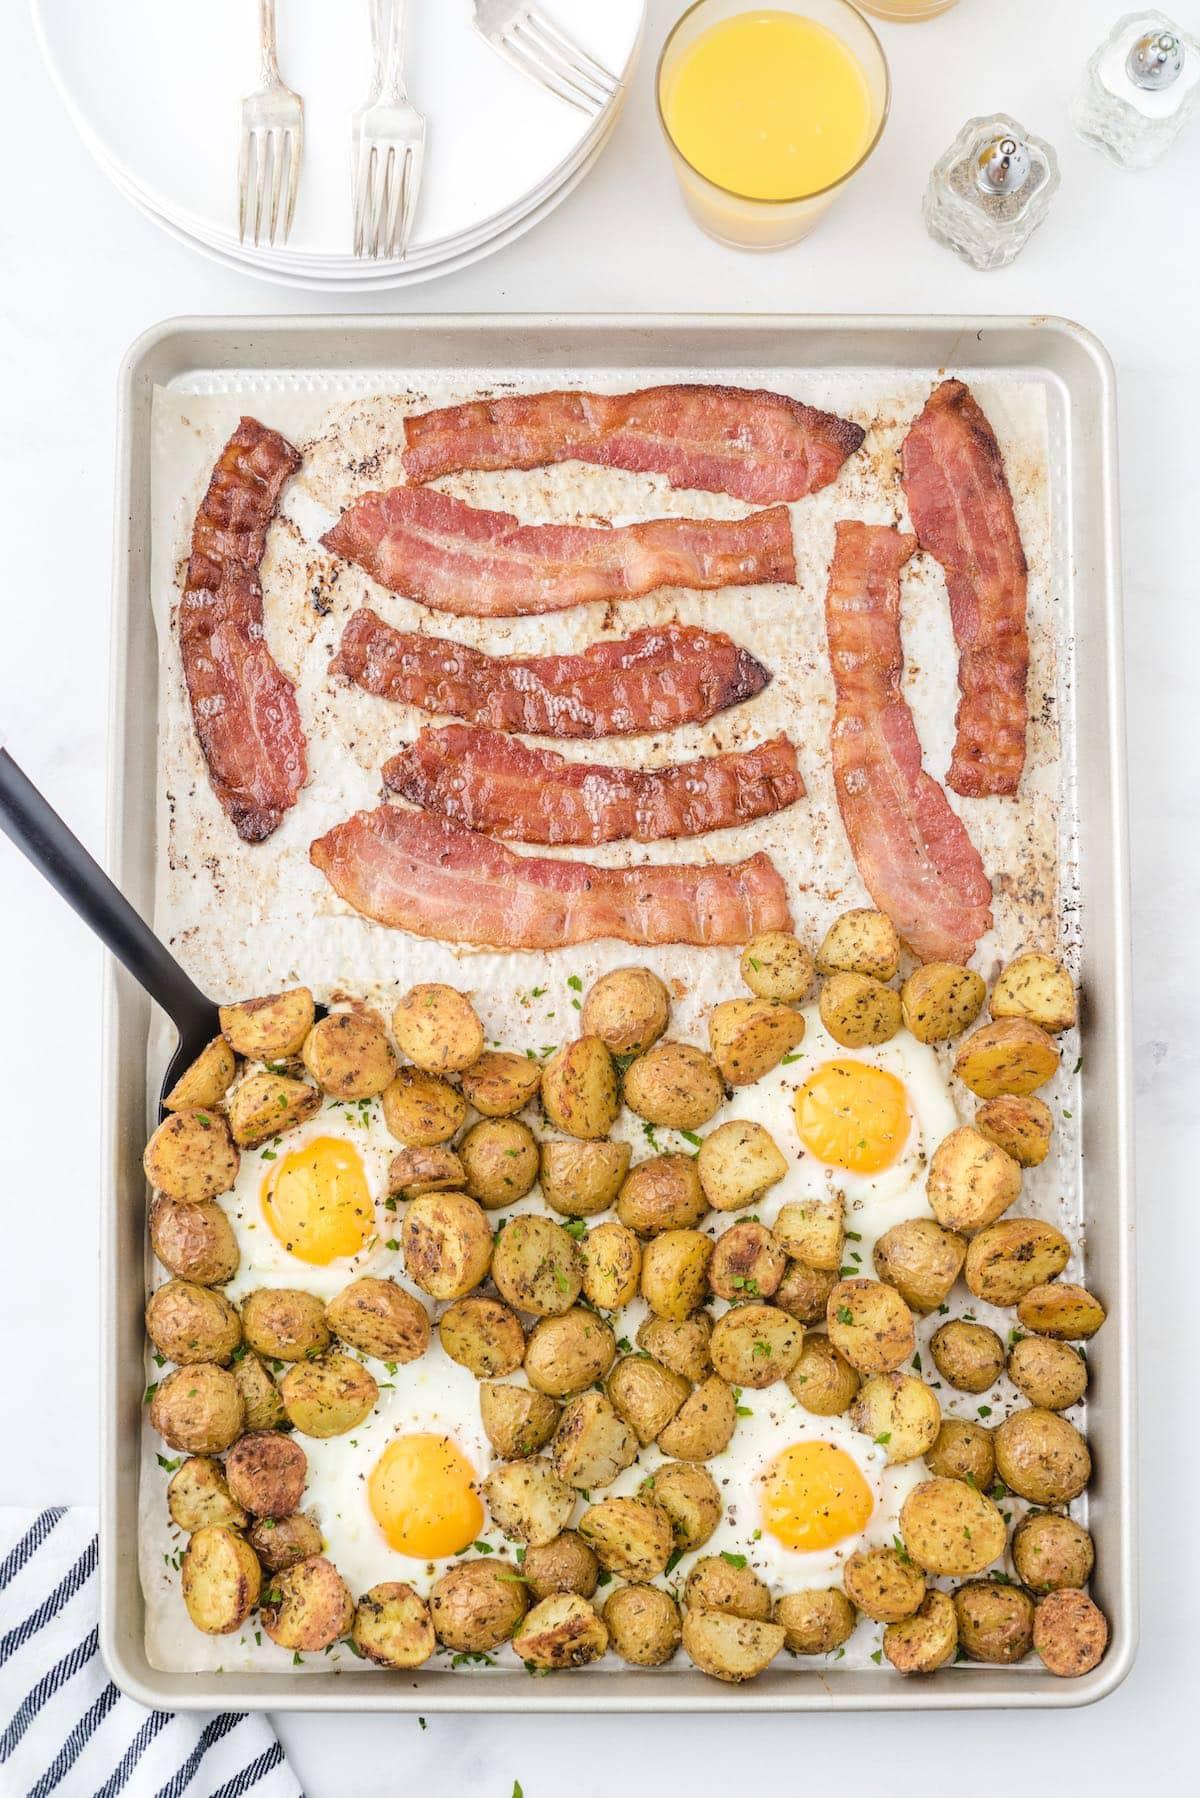 Tin pan breakfast hero image